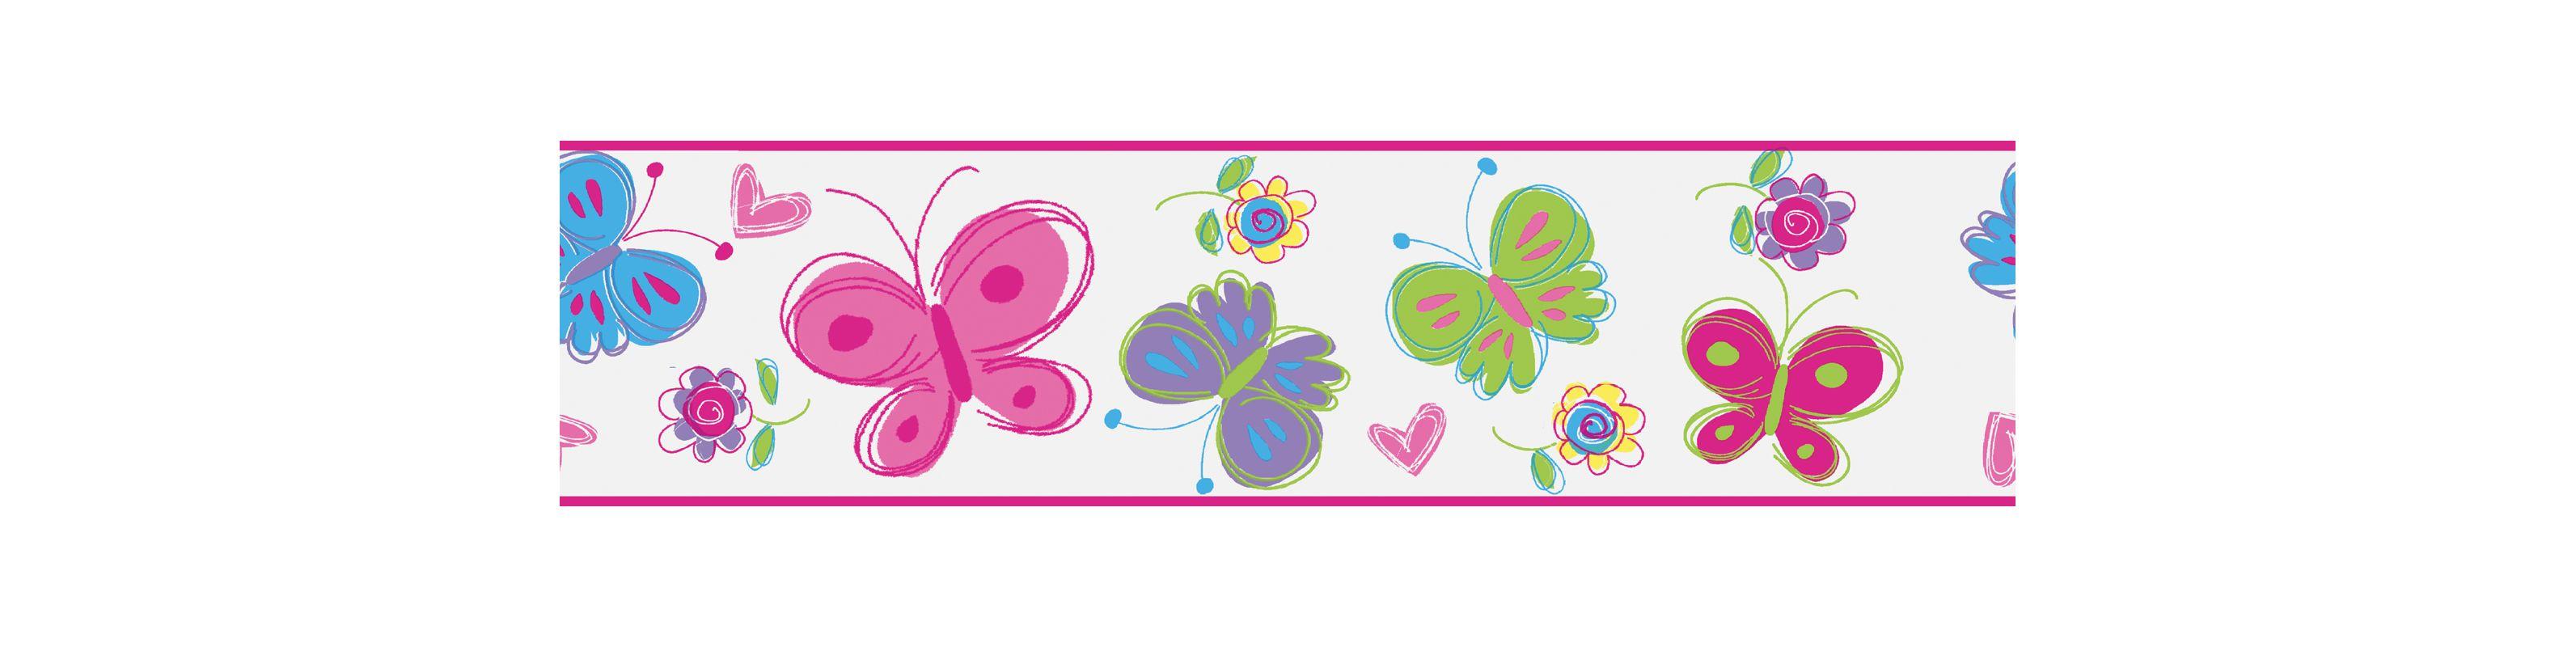 Brewster 443B97630 Butterfly Garden Border Pink Butterfly Border Pink